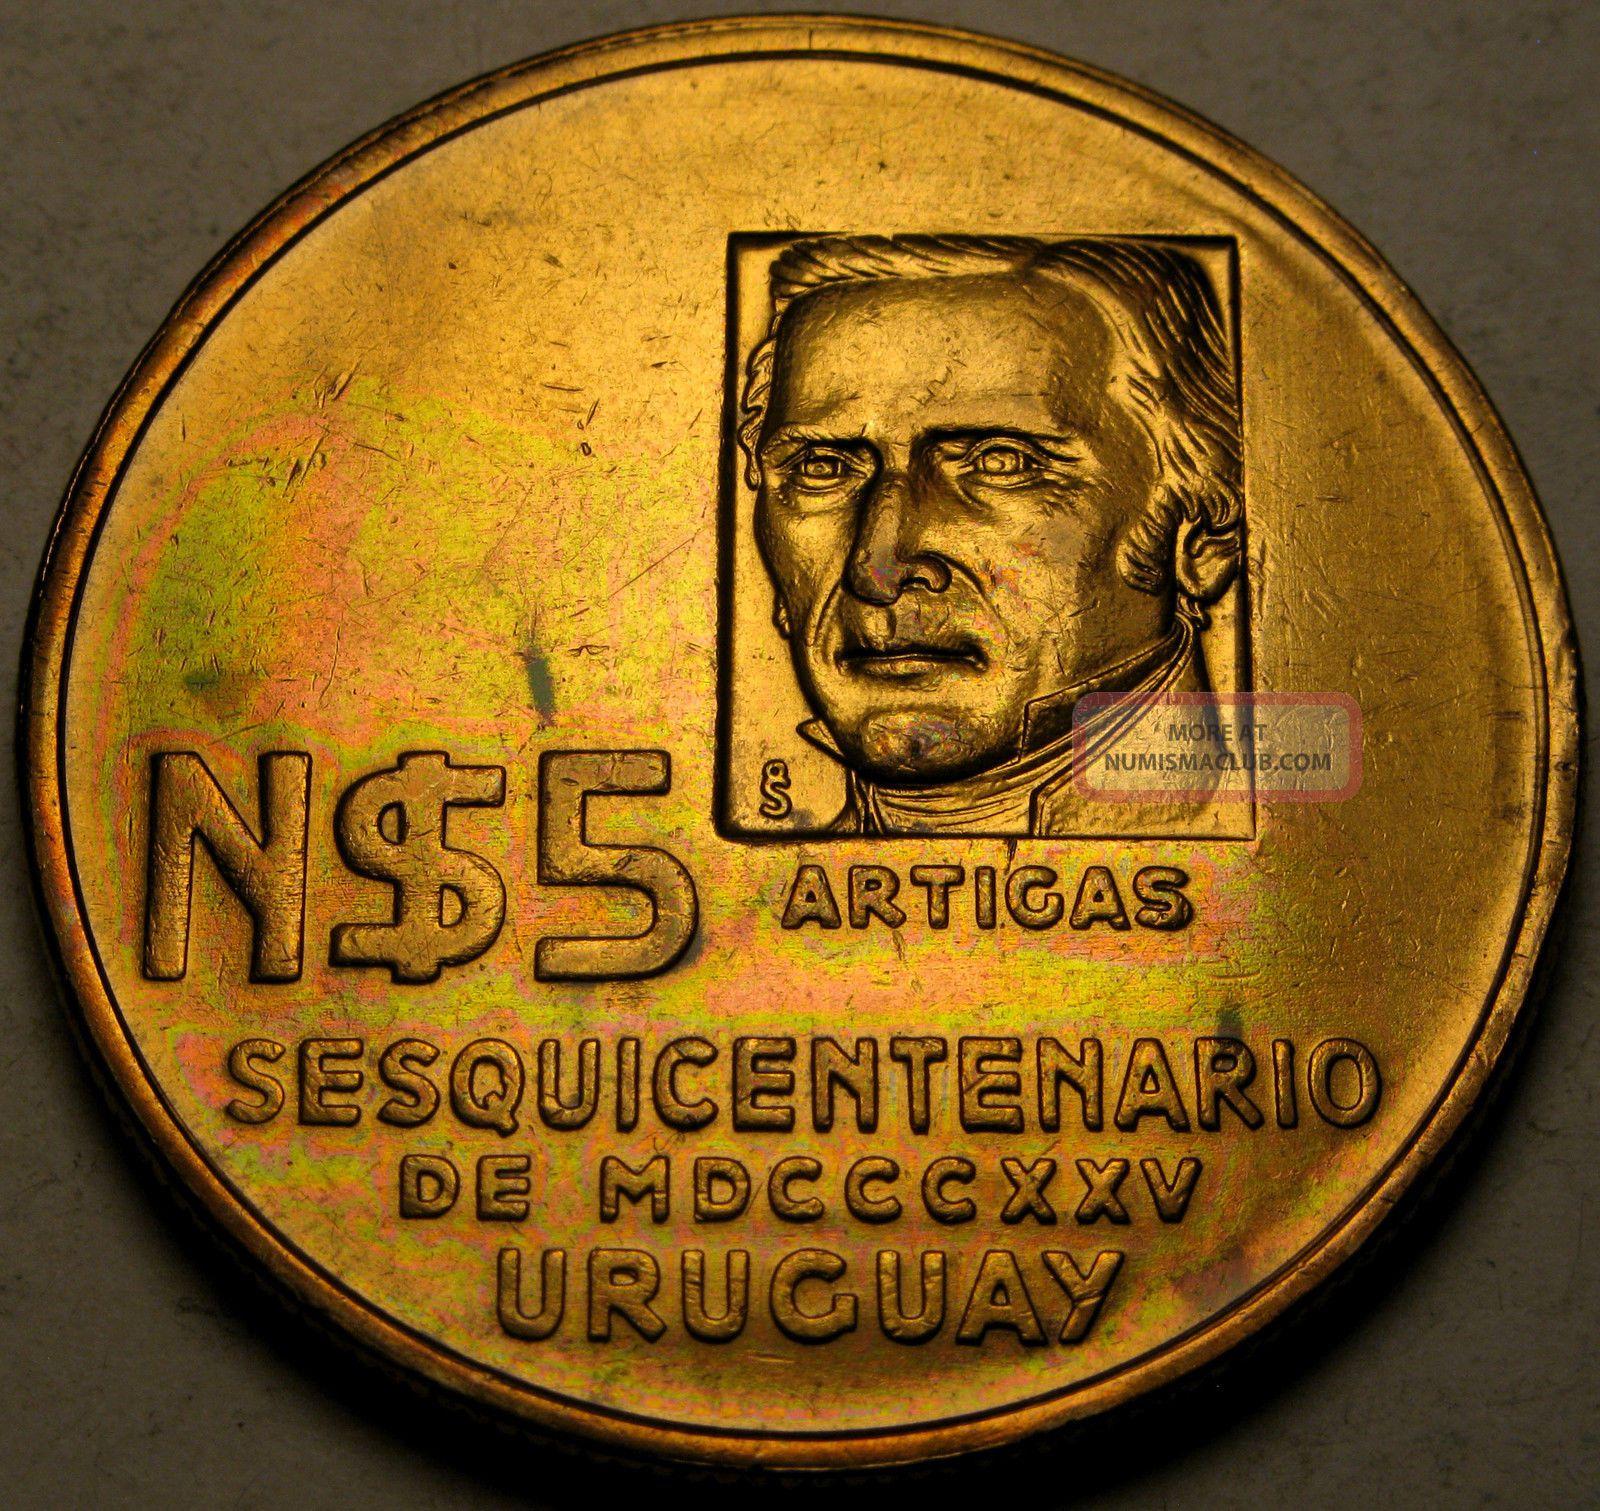 Uruguay 5 Nuevos Pesos Nd (1975) - 150th Ann.  Revolutionary Movement - Xf - 914 South America photo